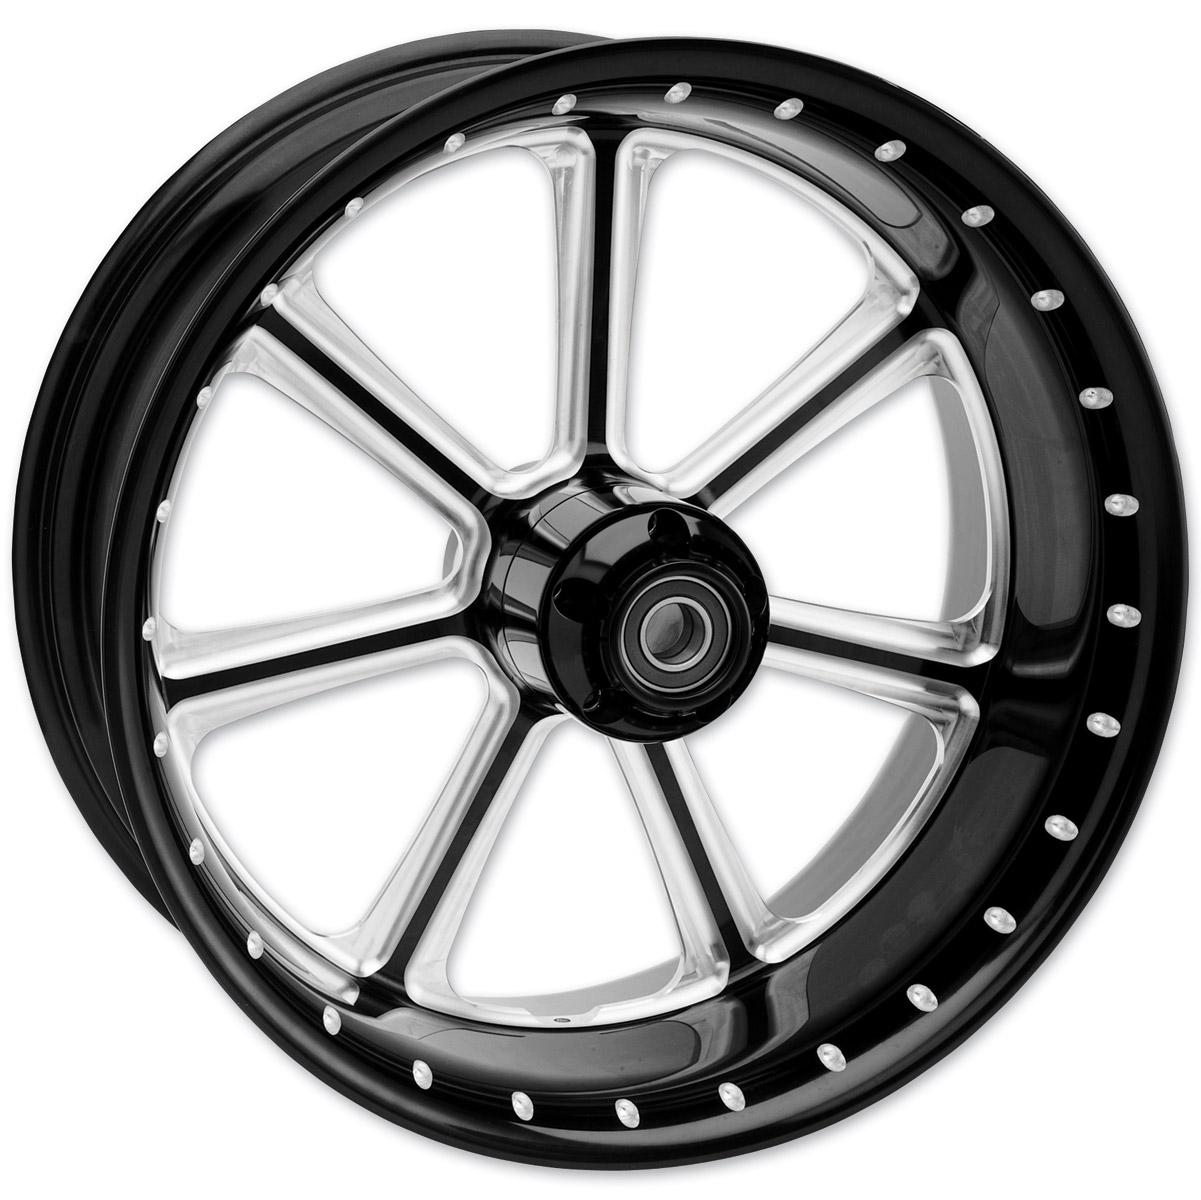 Roland Sands Design Contrast Cut Diesel Rear Wheel, 18″ x 5.5″